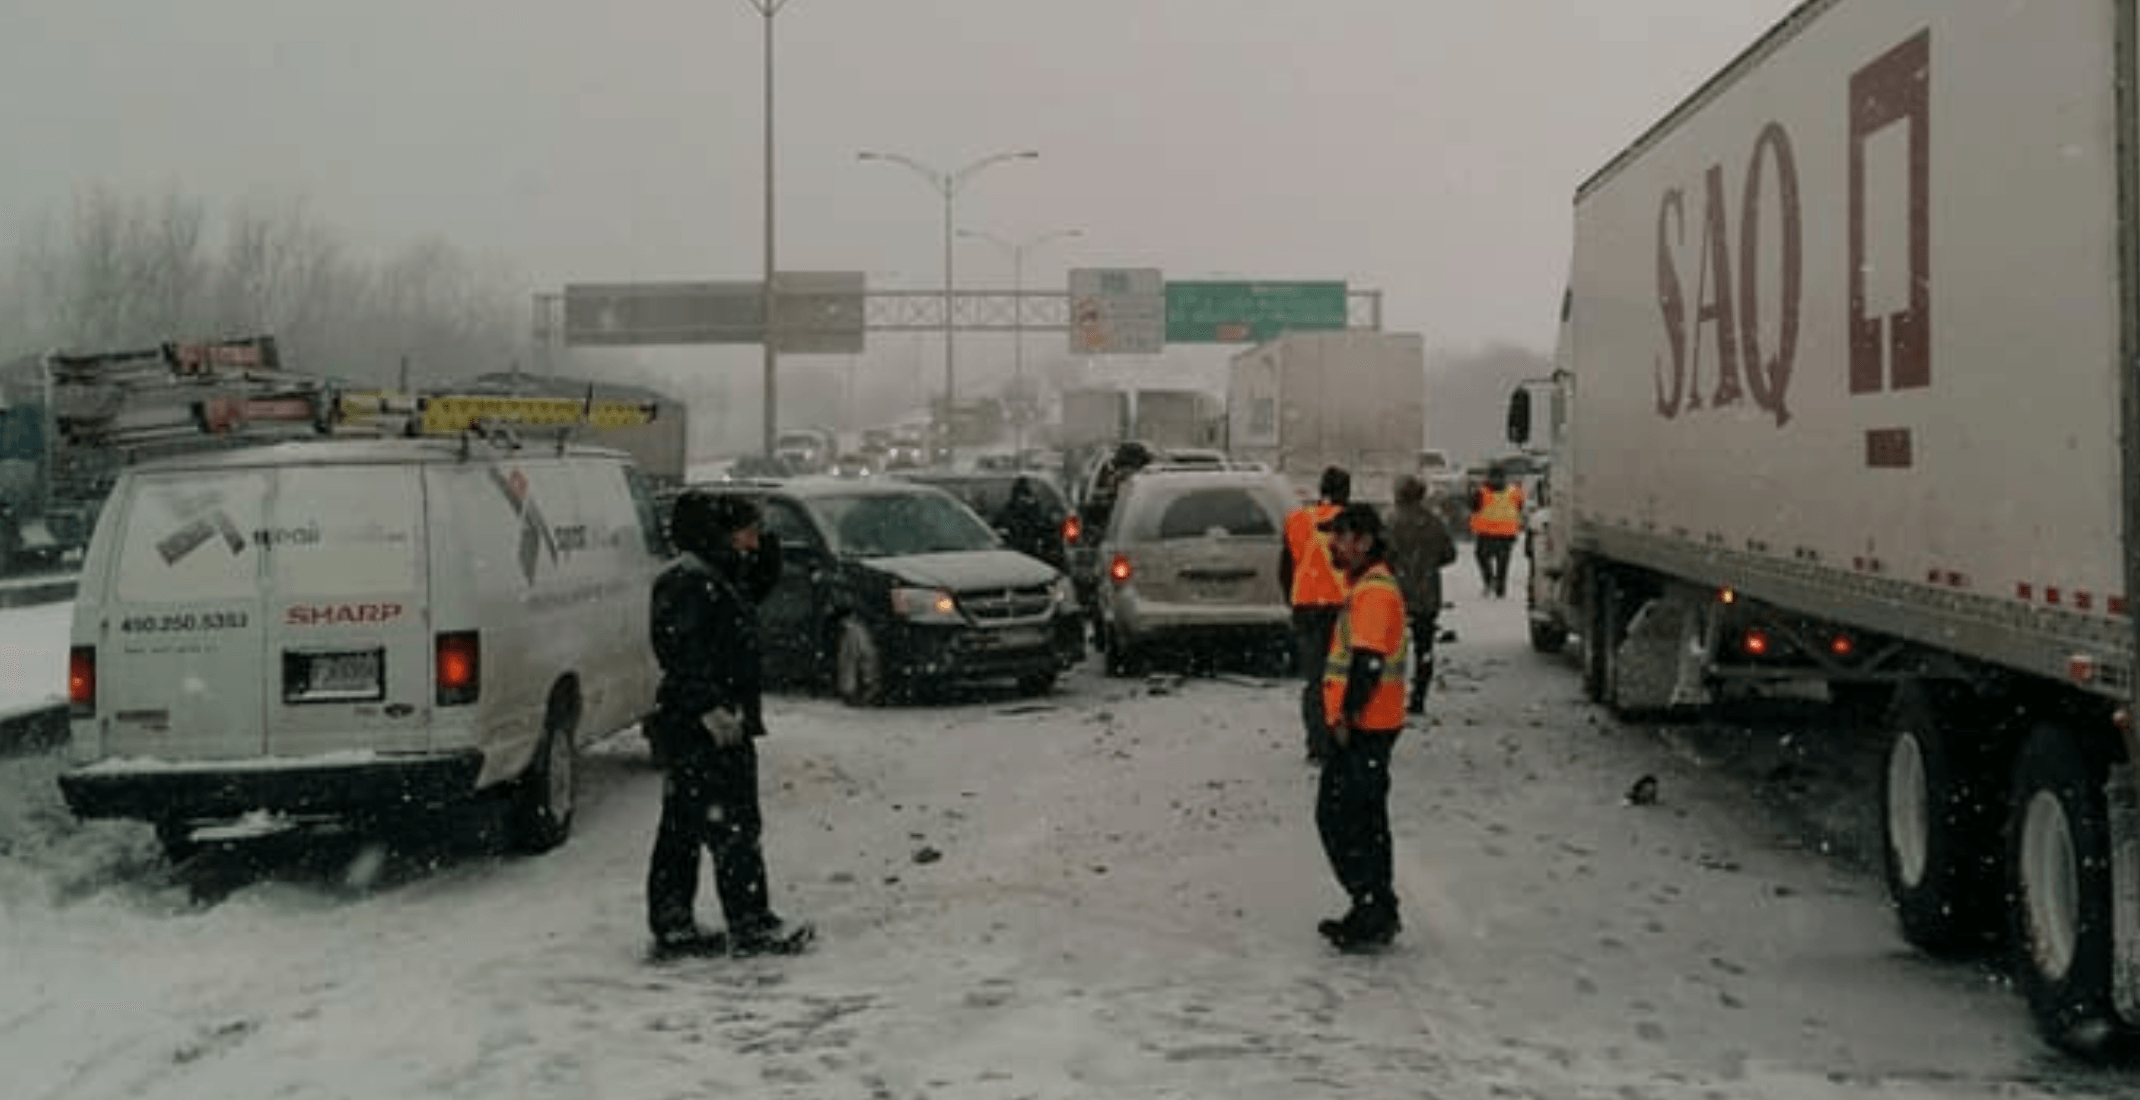 Multi-car pileup halts traffic on Highway 20 near Mont-Saint-Hilaire